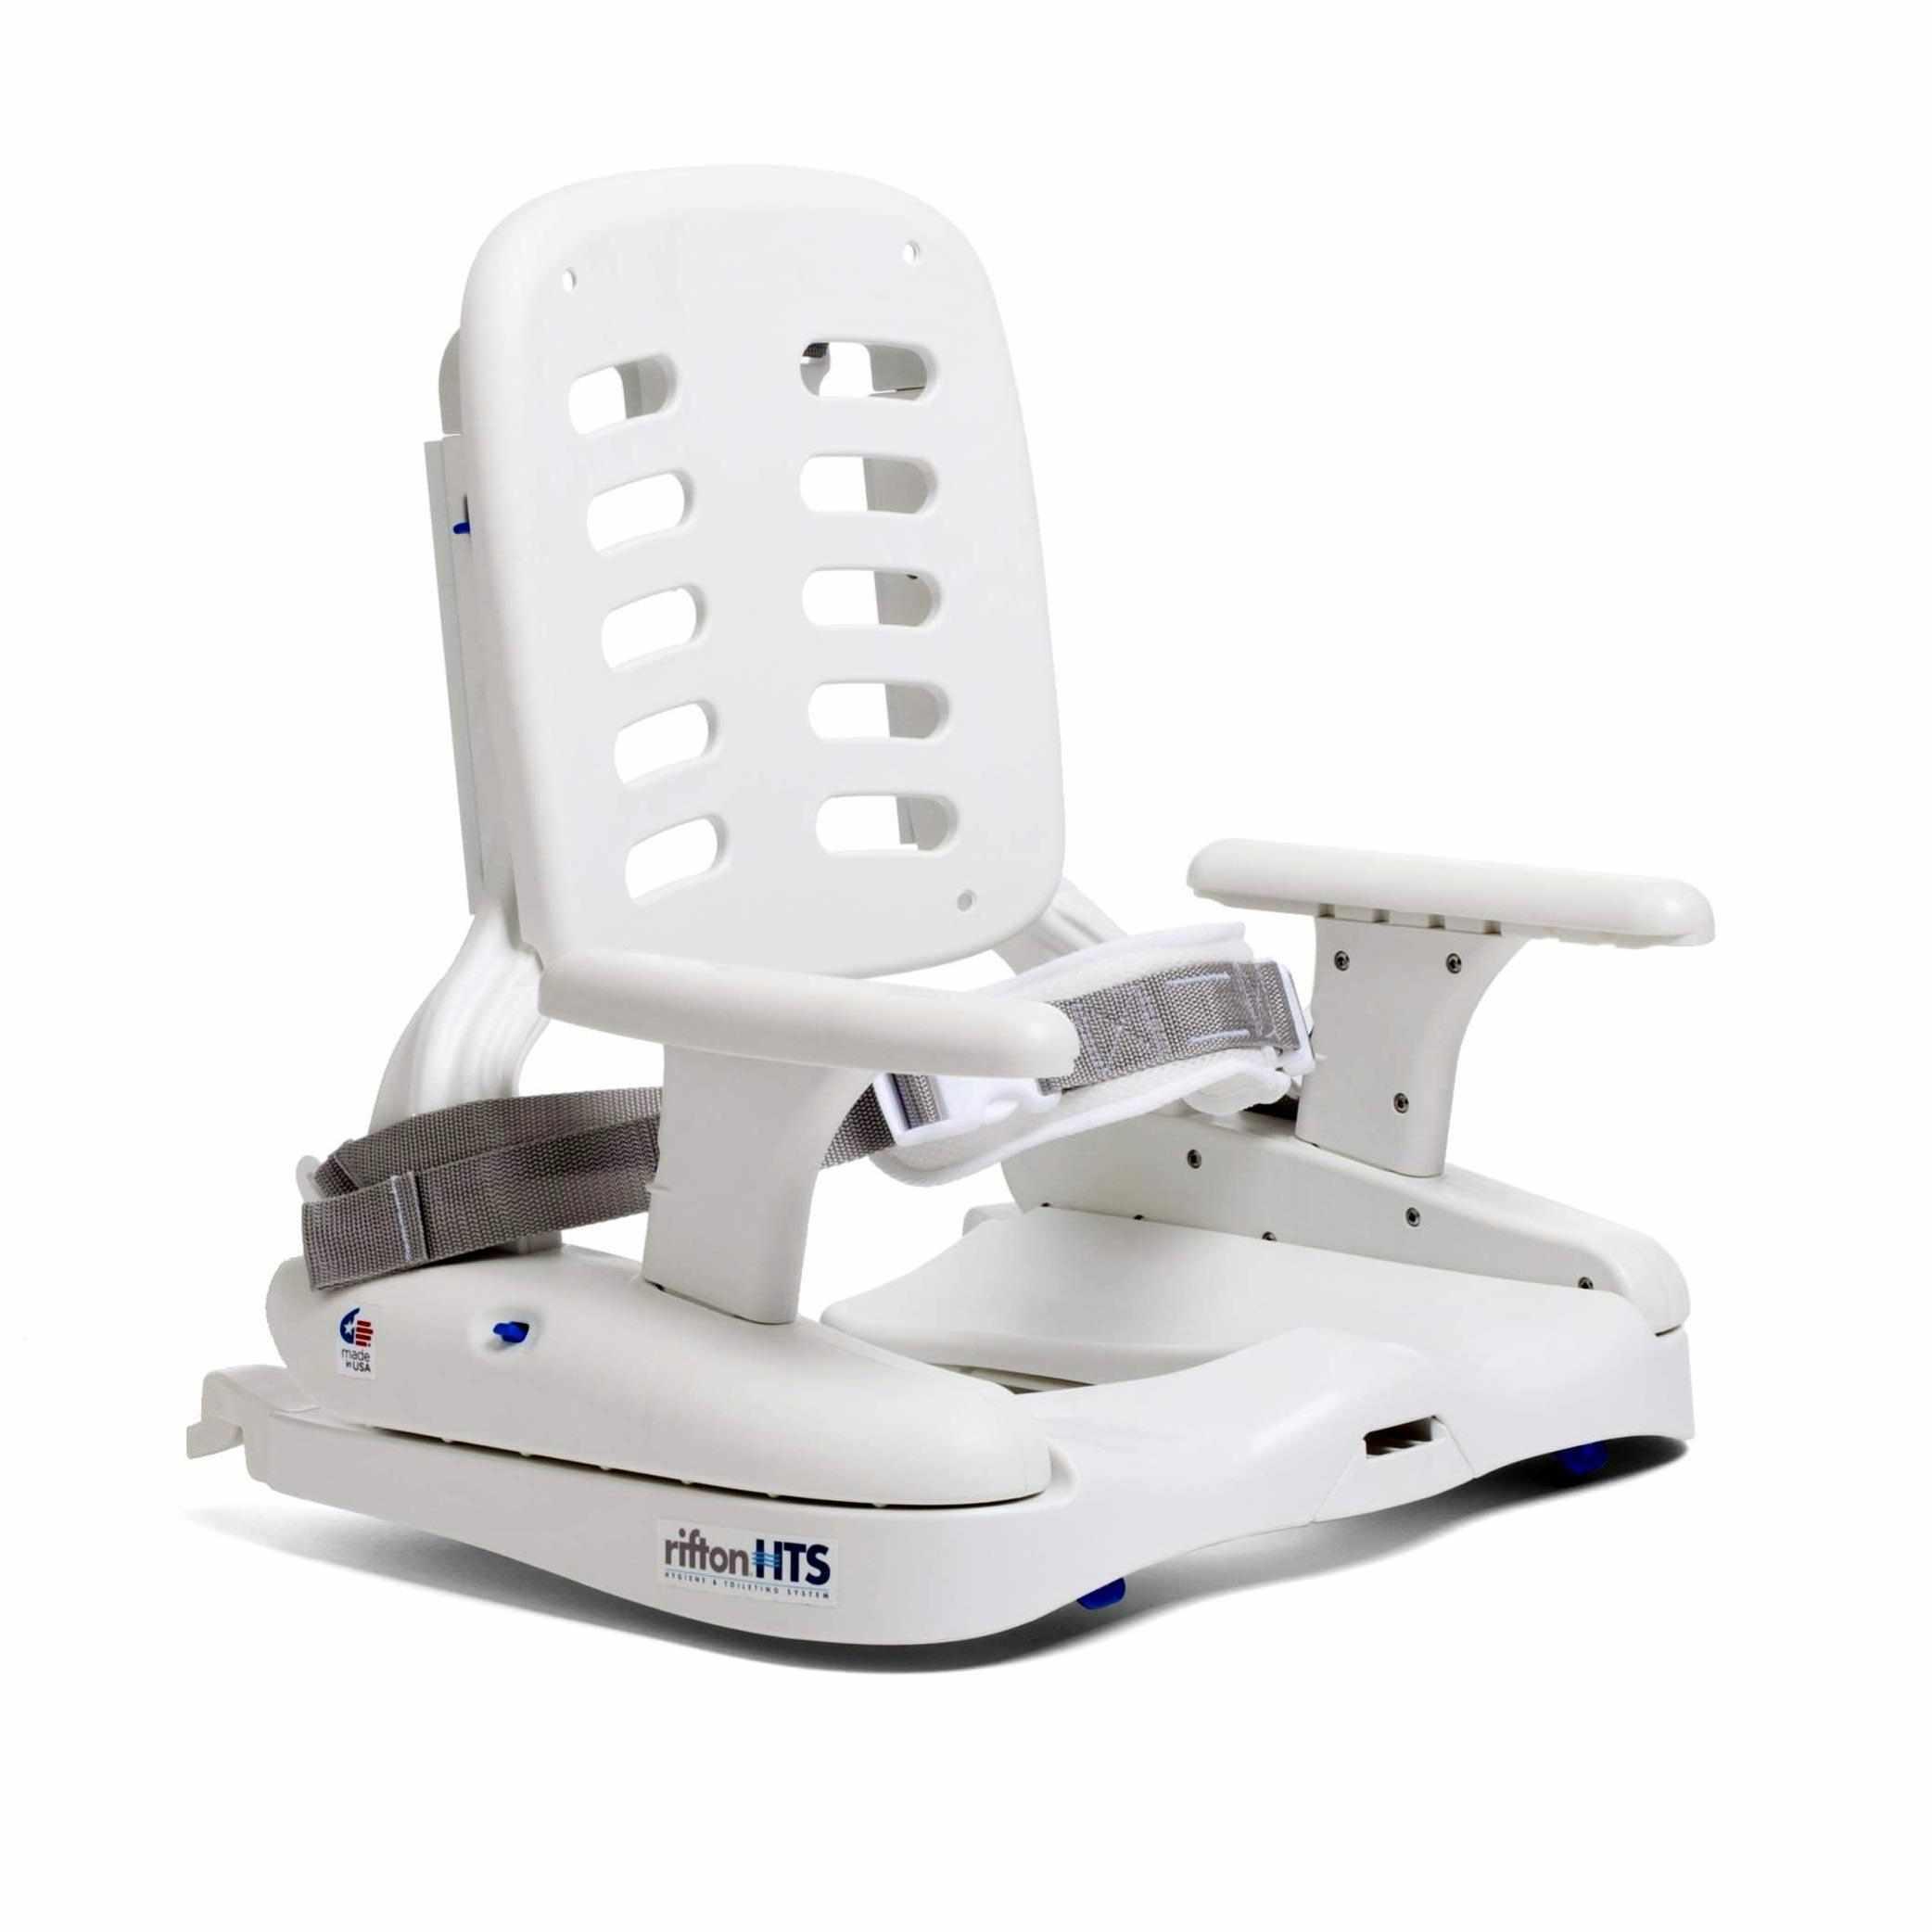 Rifton Medium HTS hygiene toileting system